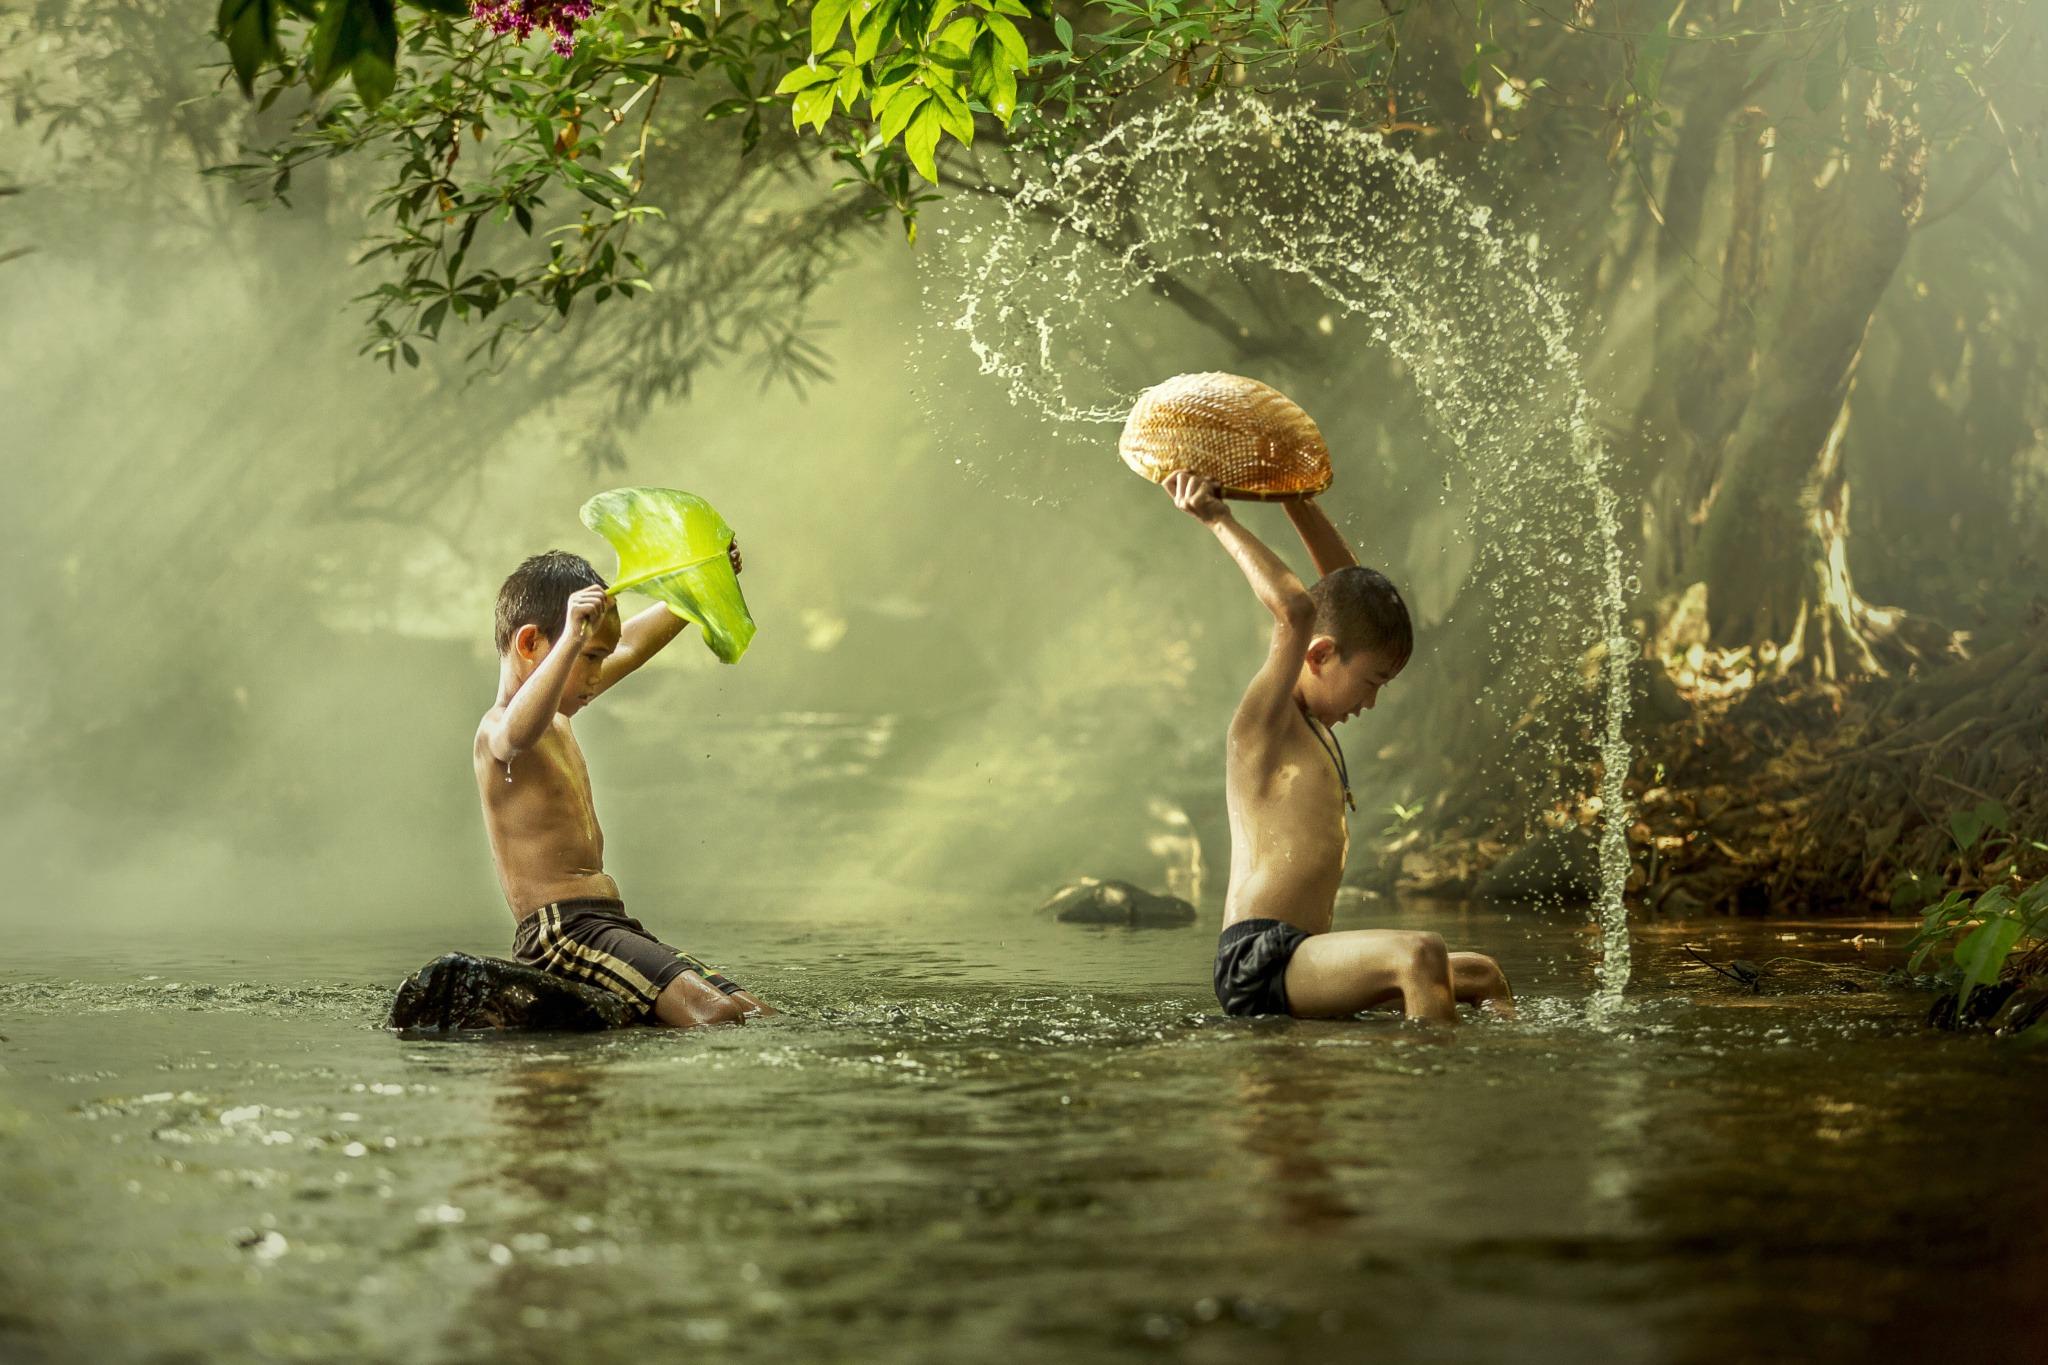 Thai boys splashing whit in a river.